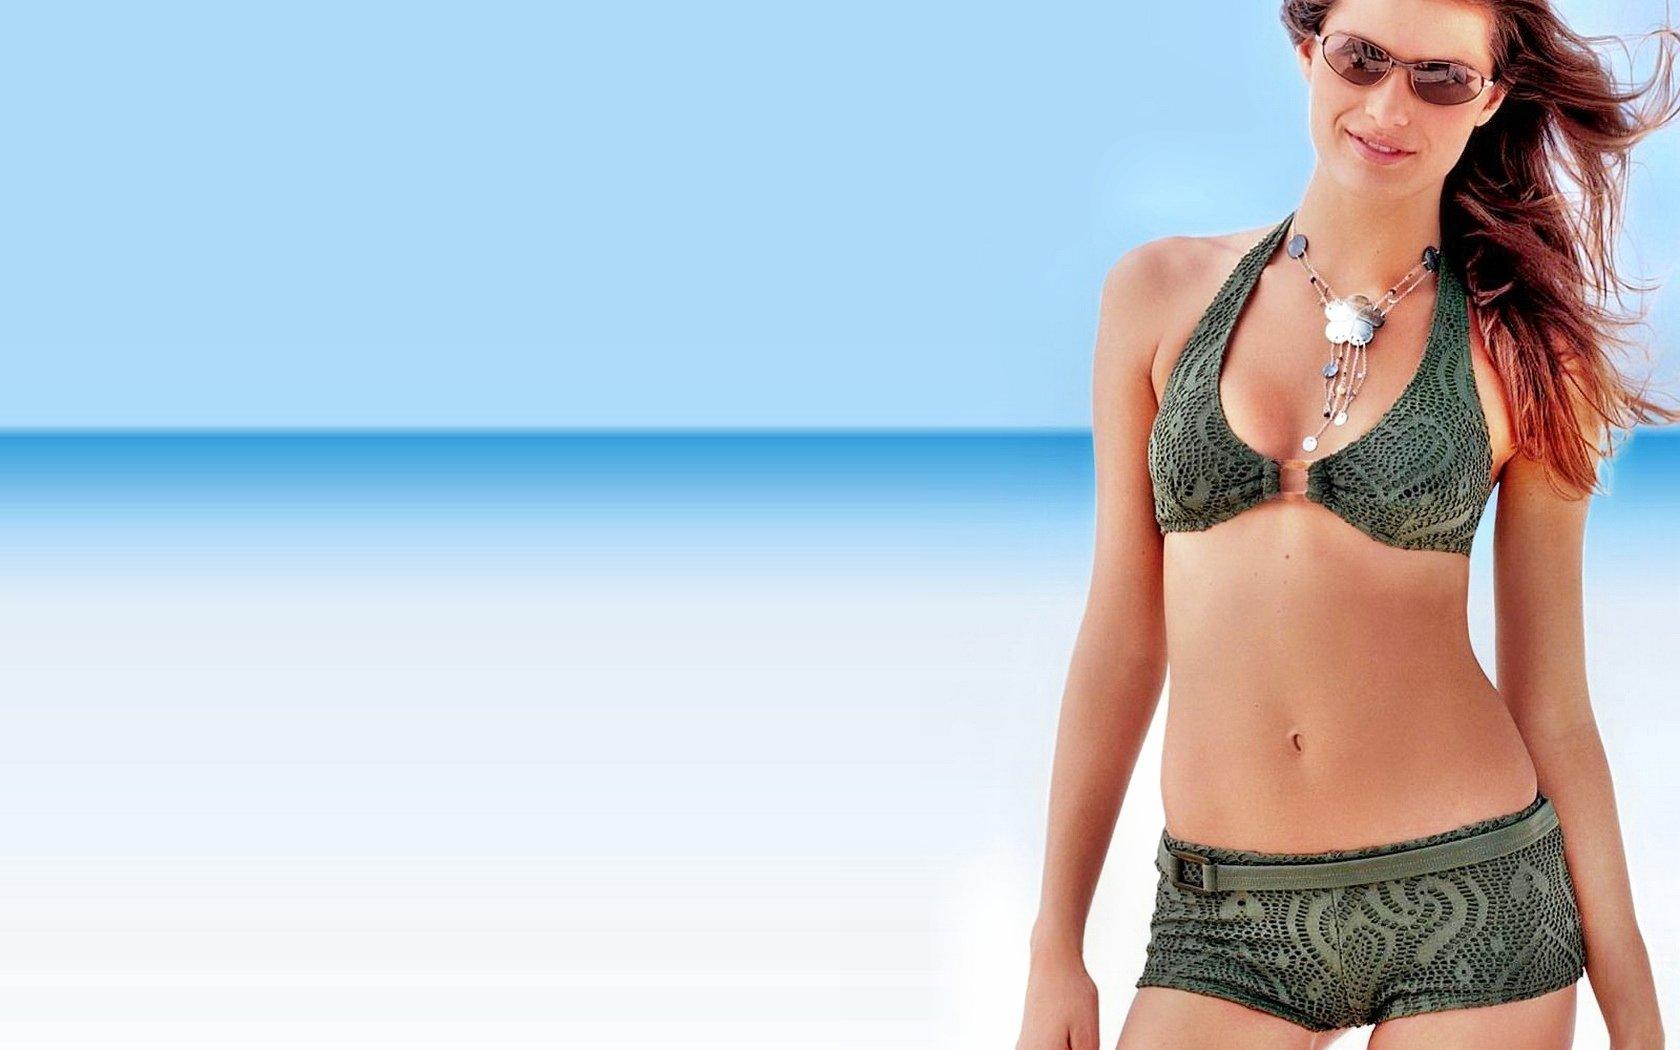 bikini wallpapers 1680x1050 desktop backgrounds